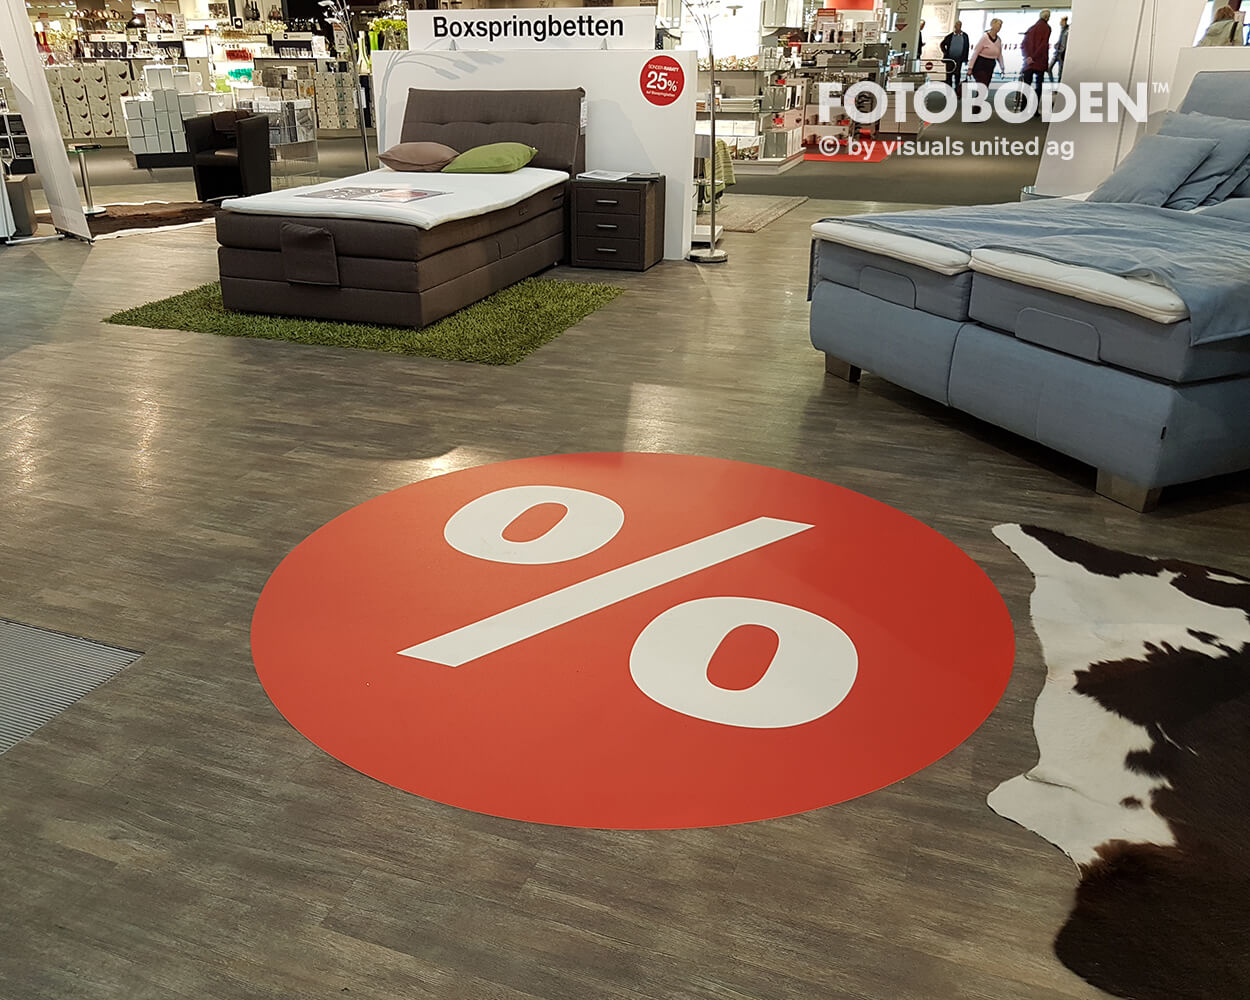 VMZB Fotoboden Flooring Fußboden Bodengestaltung Floorminder Bodendruck Werbung Fußbodenwerbung Bodenwerbung Merchandising Advertising2